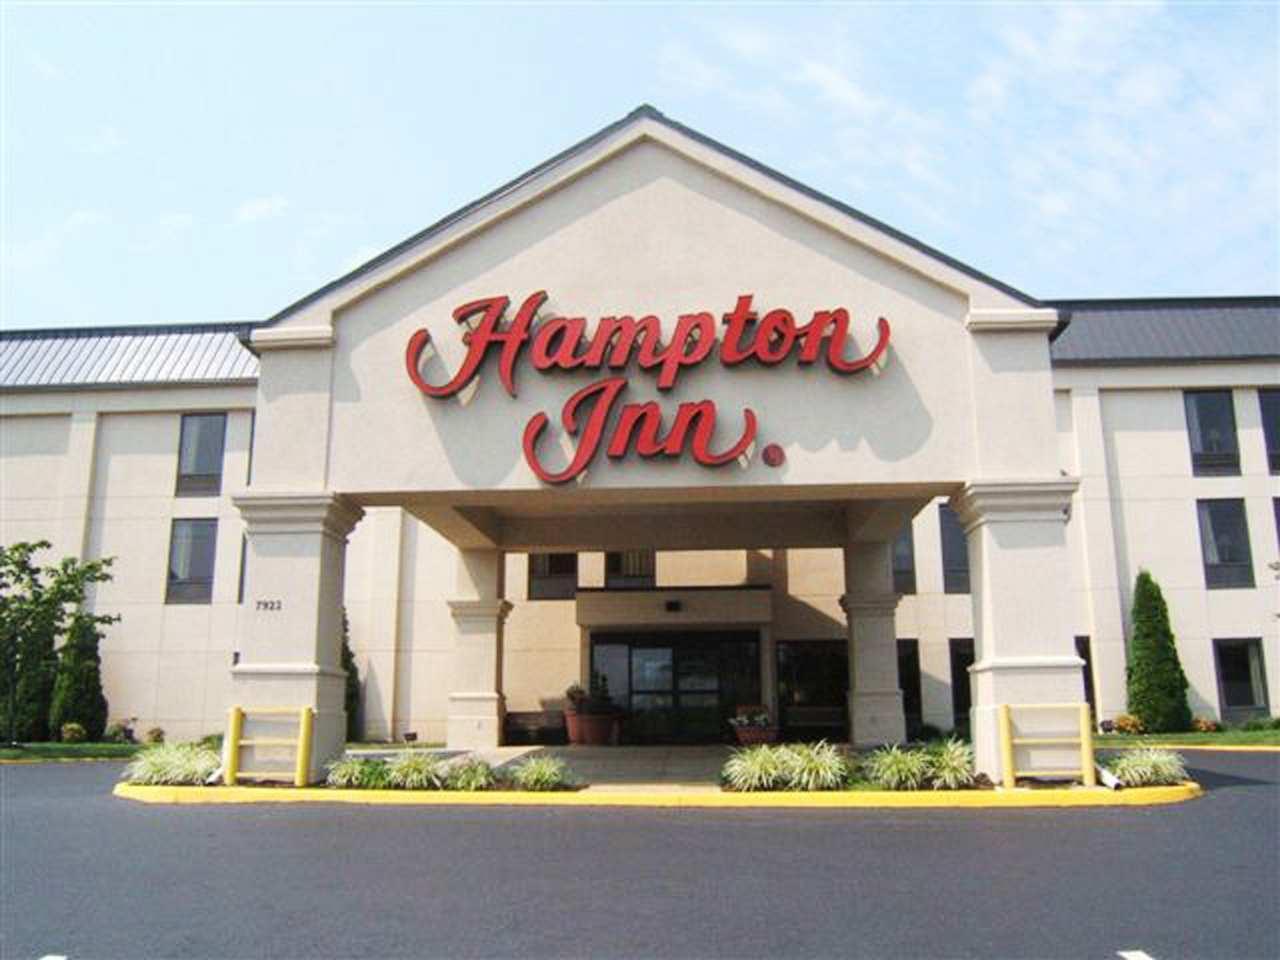 Hampton Inn Roanoke/Hollins - I-81 image 1